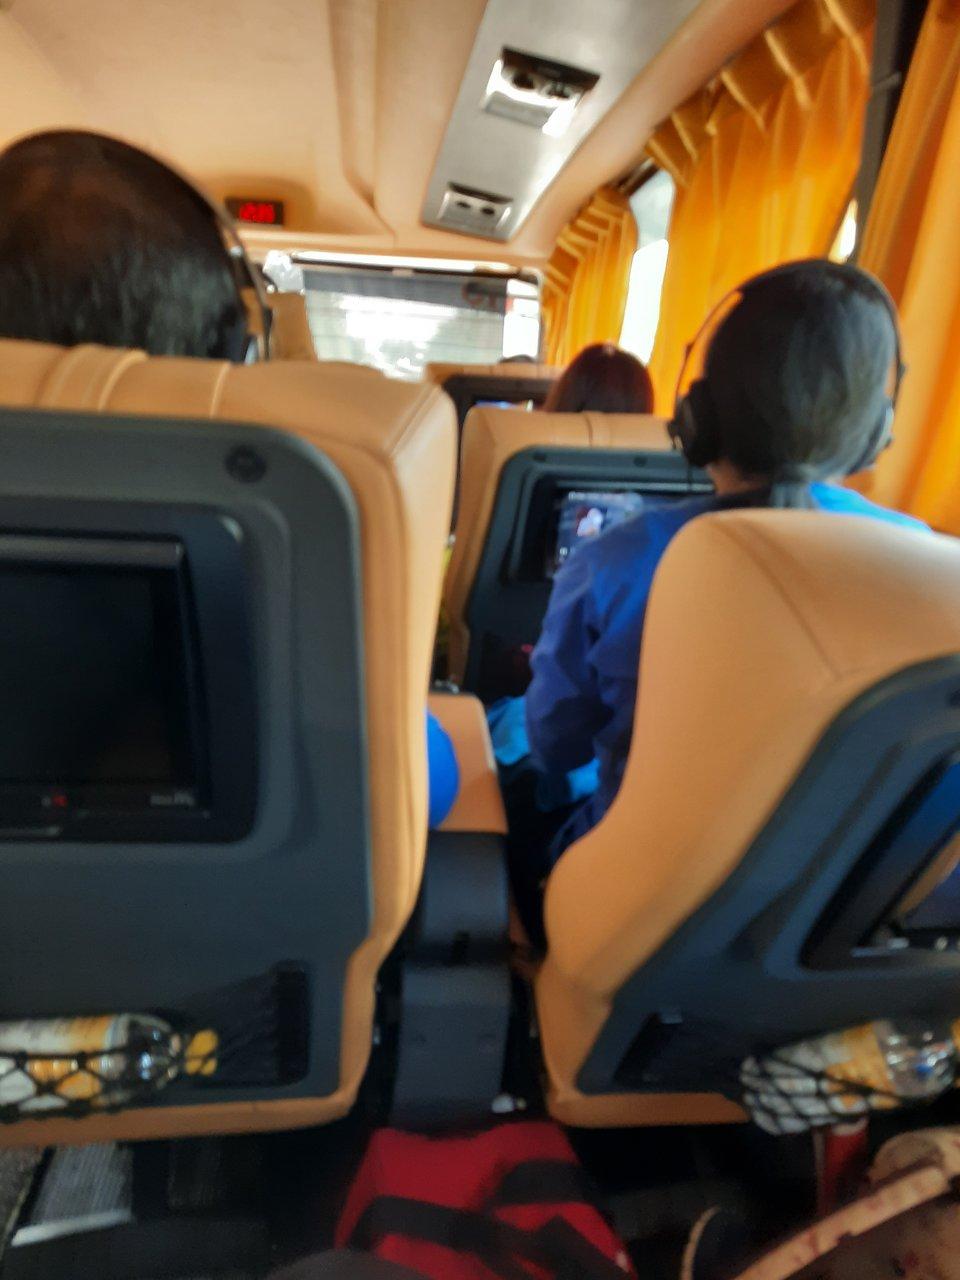 Aeroline bus